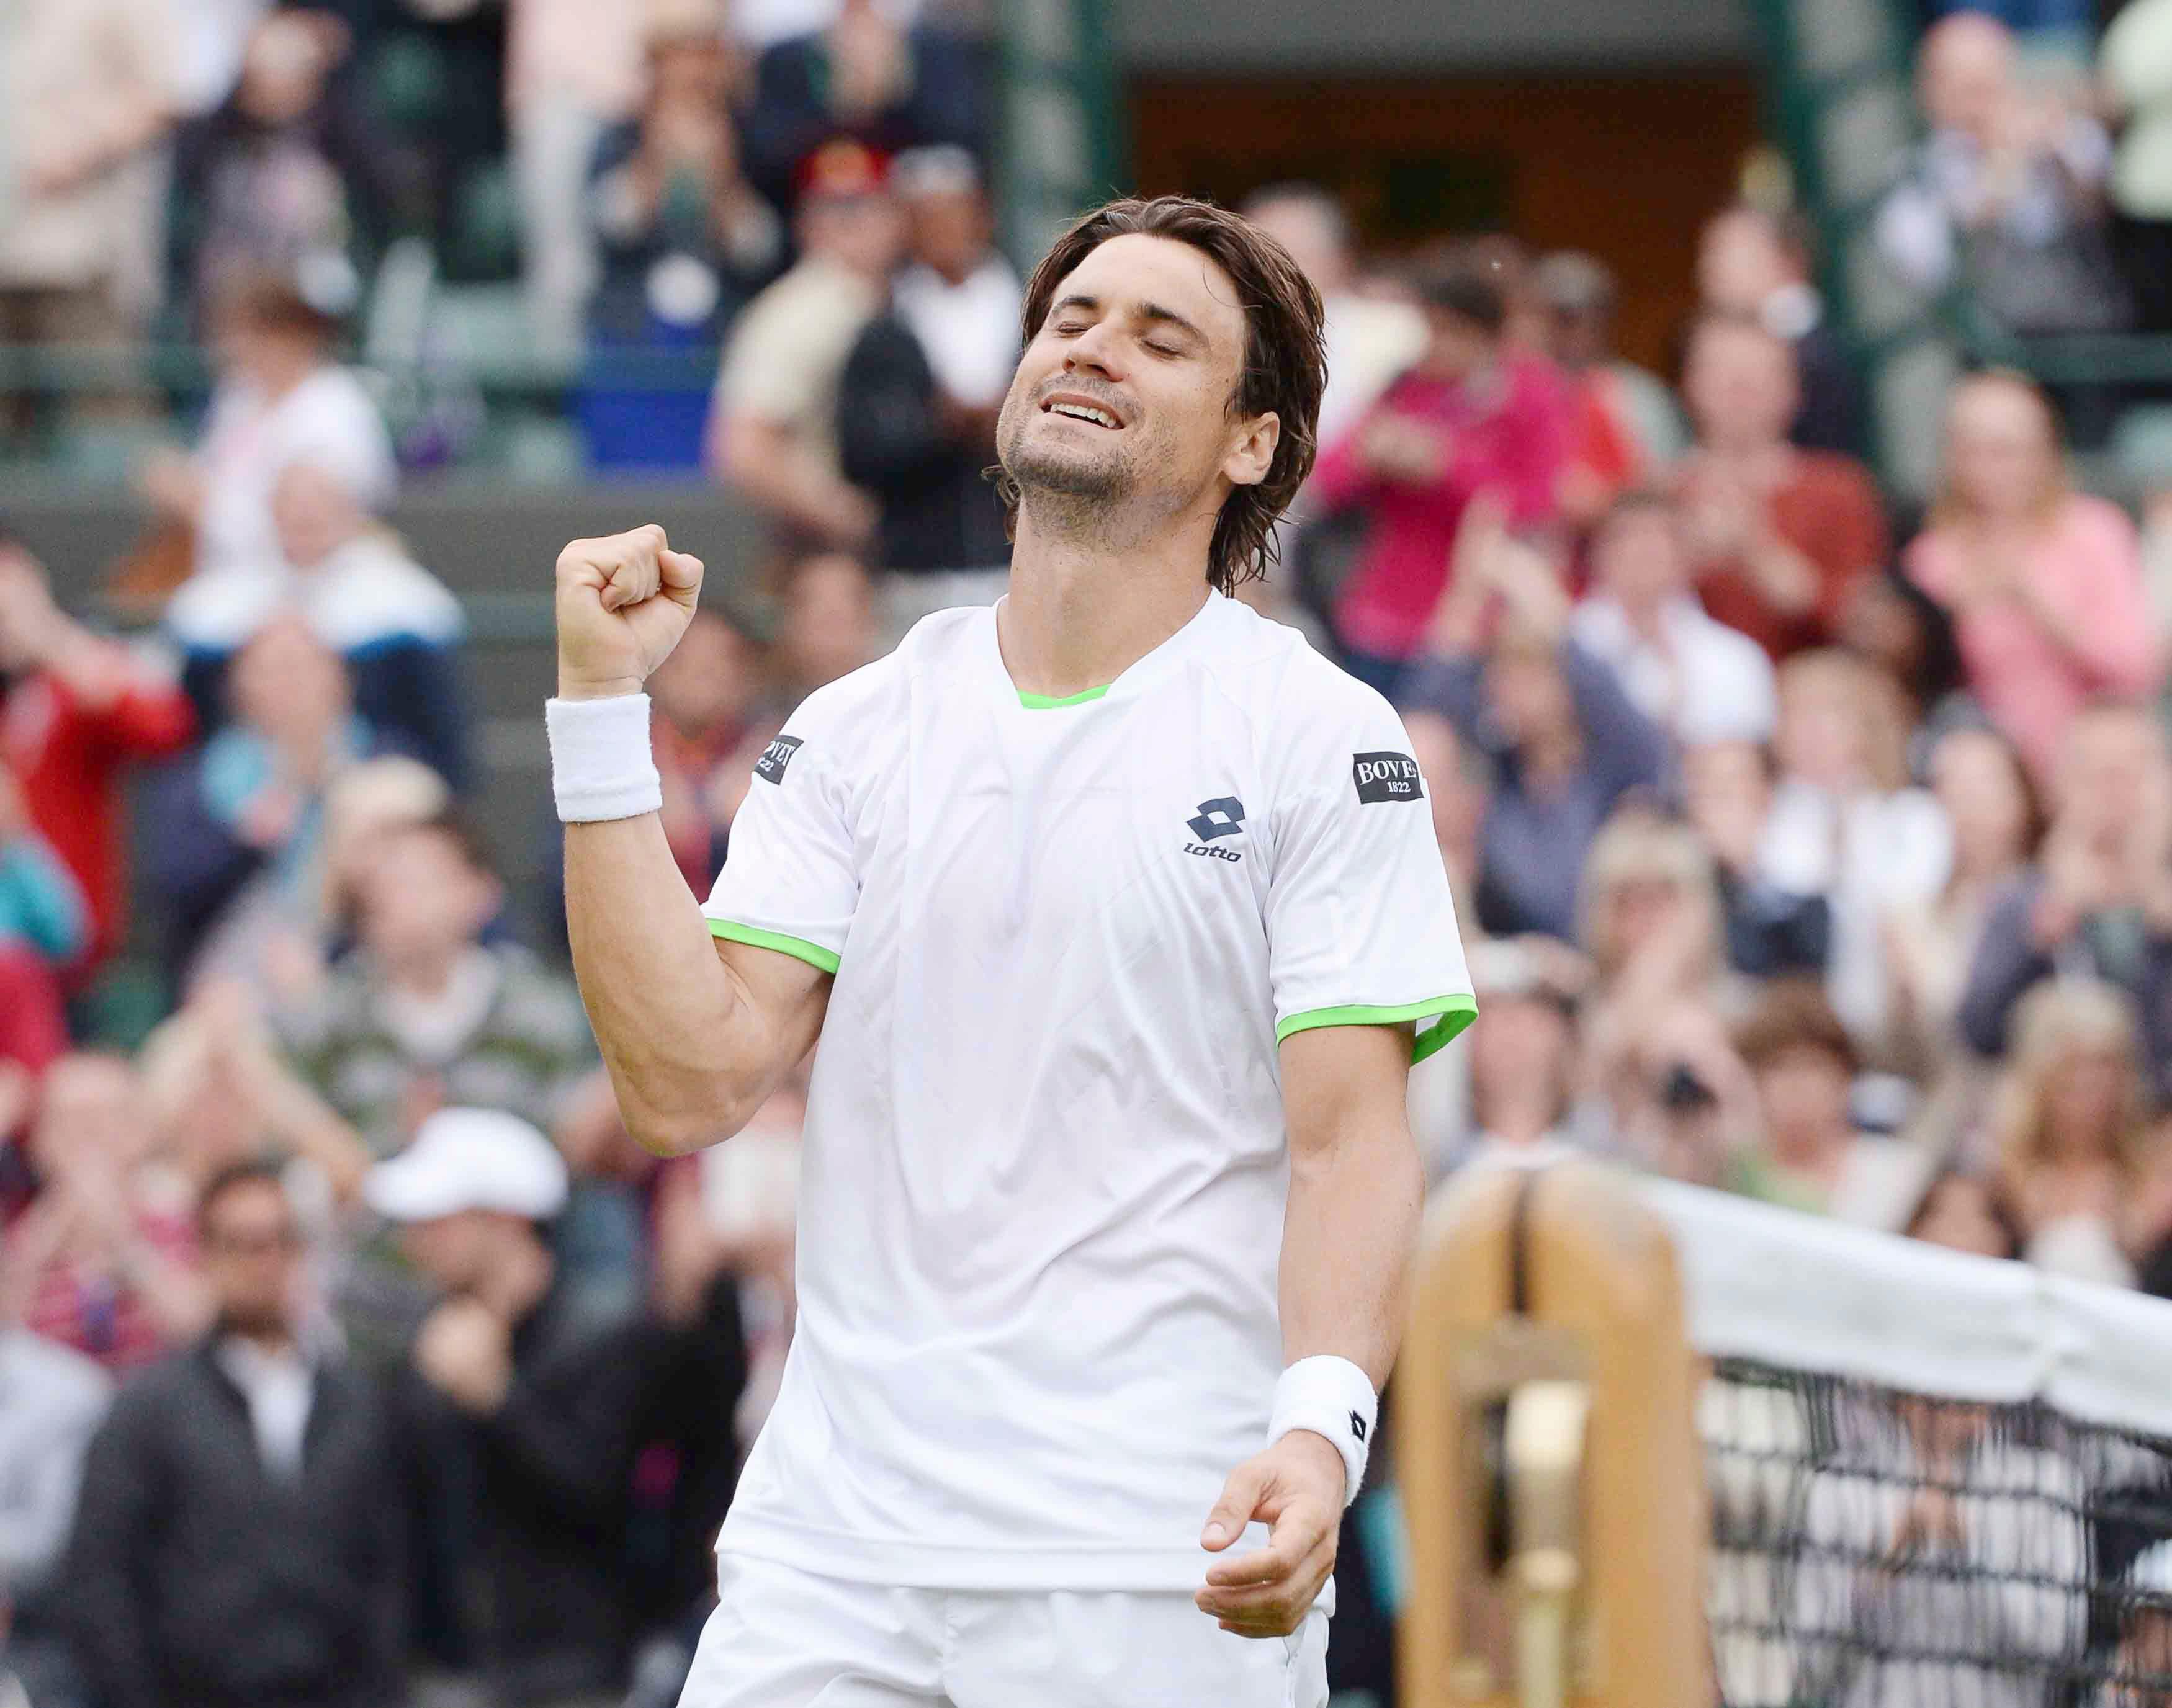 Ferrer vence a Ivan Doding en cuatro sets y ya está en cuartos de Wimbledon